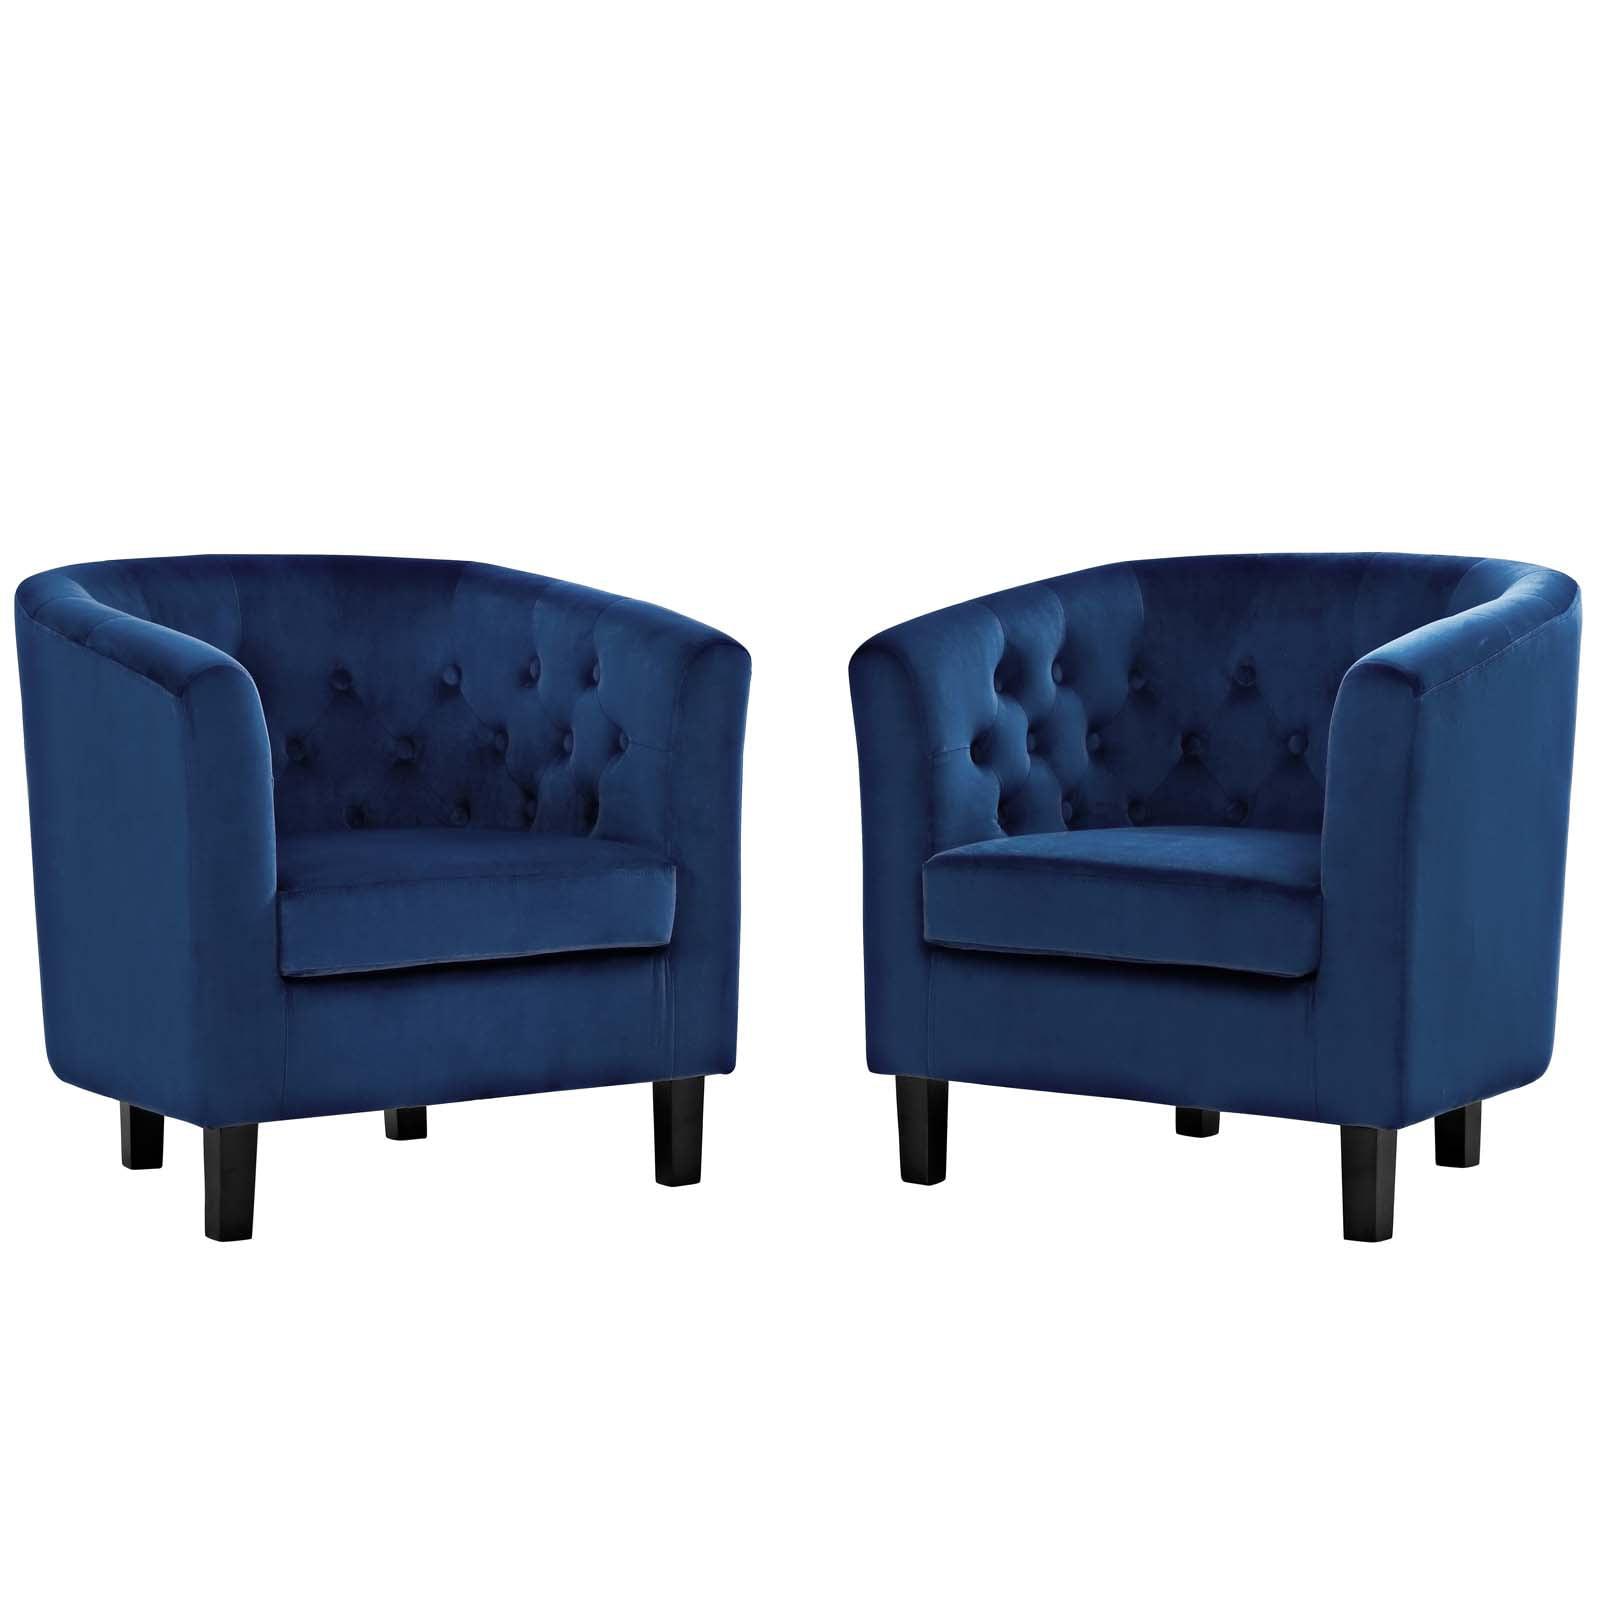 mod uptown chesterfield chair navy blue  walmart